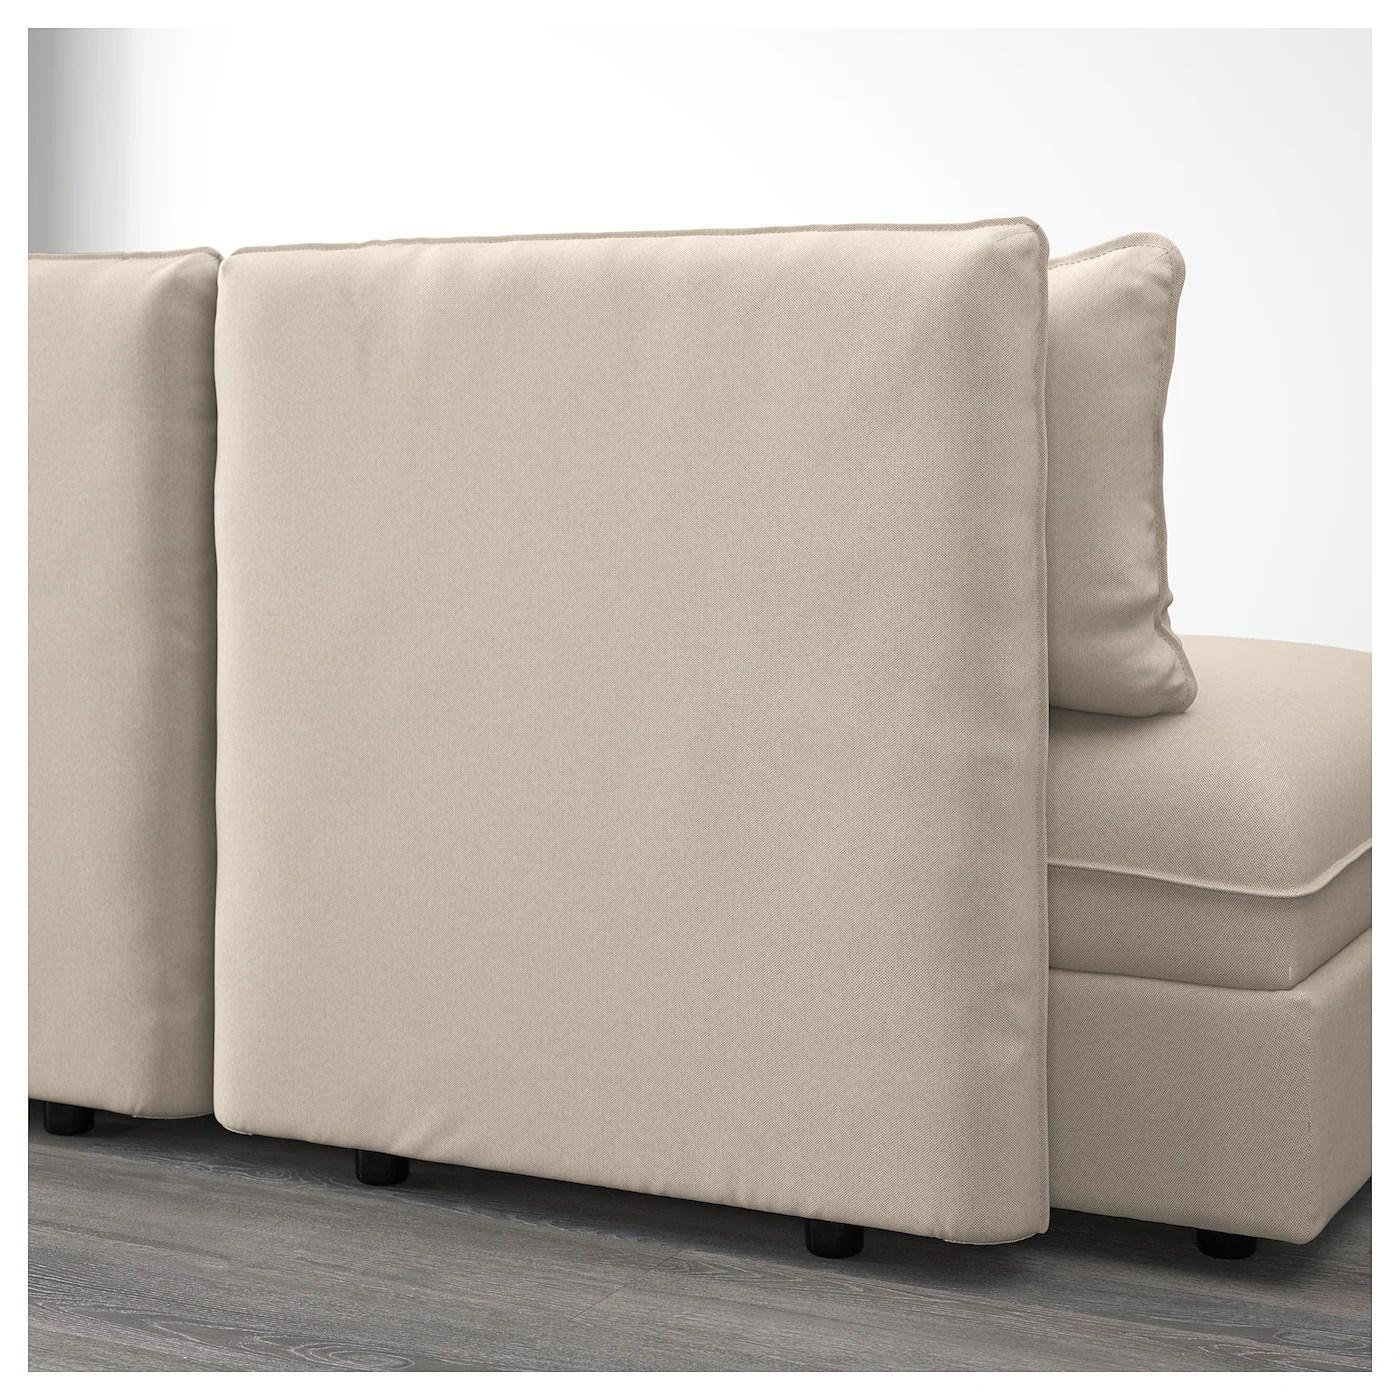 canapés vallentuna   vallentuna canapé 3 places 43 couch orrsta